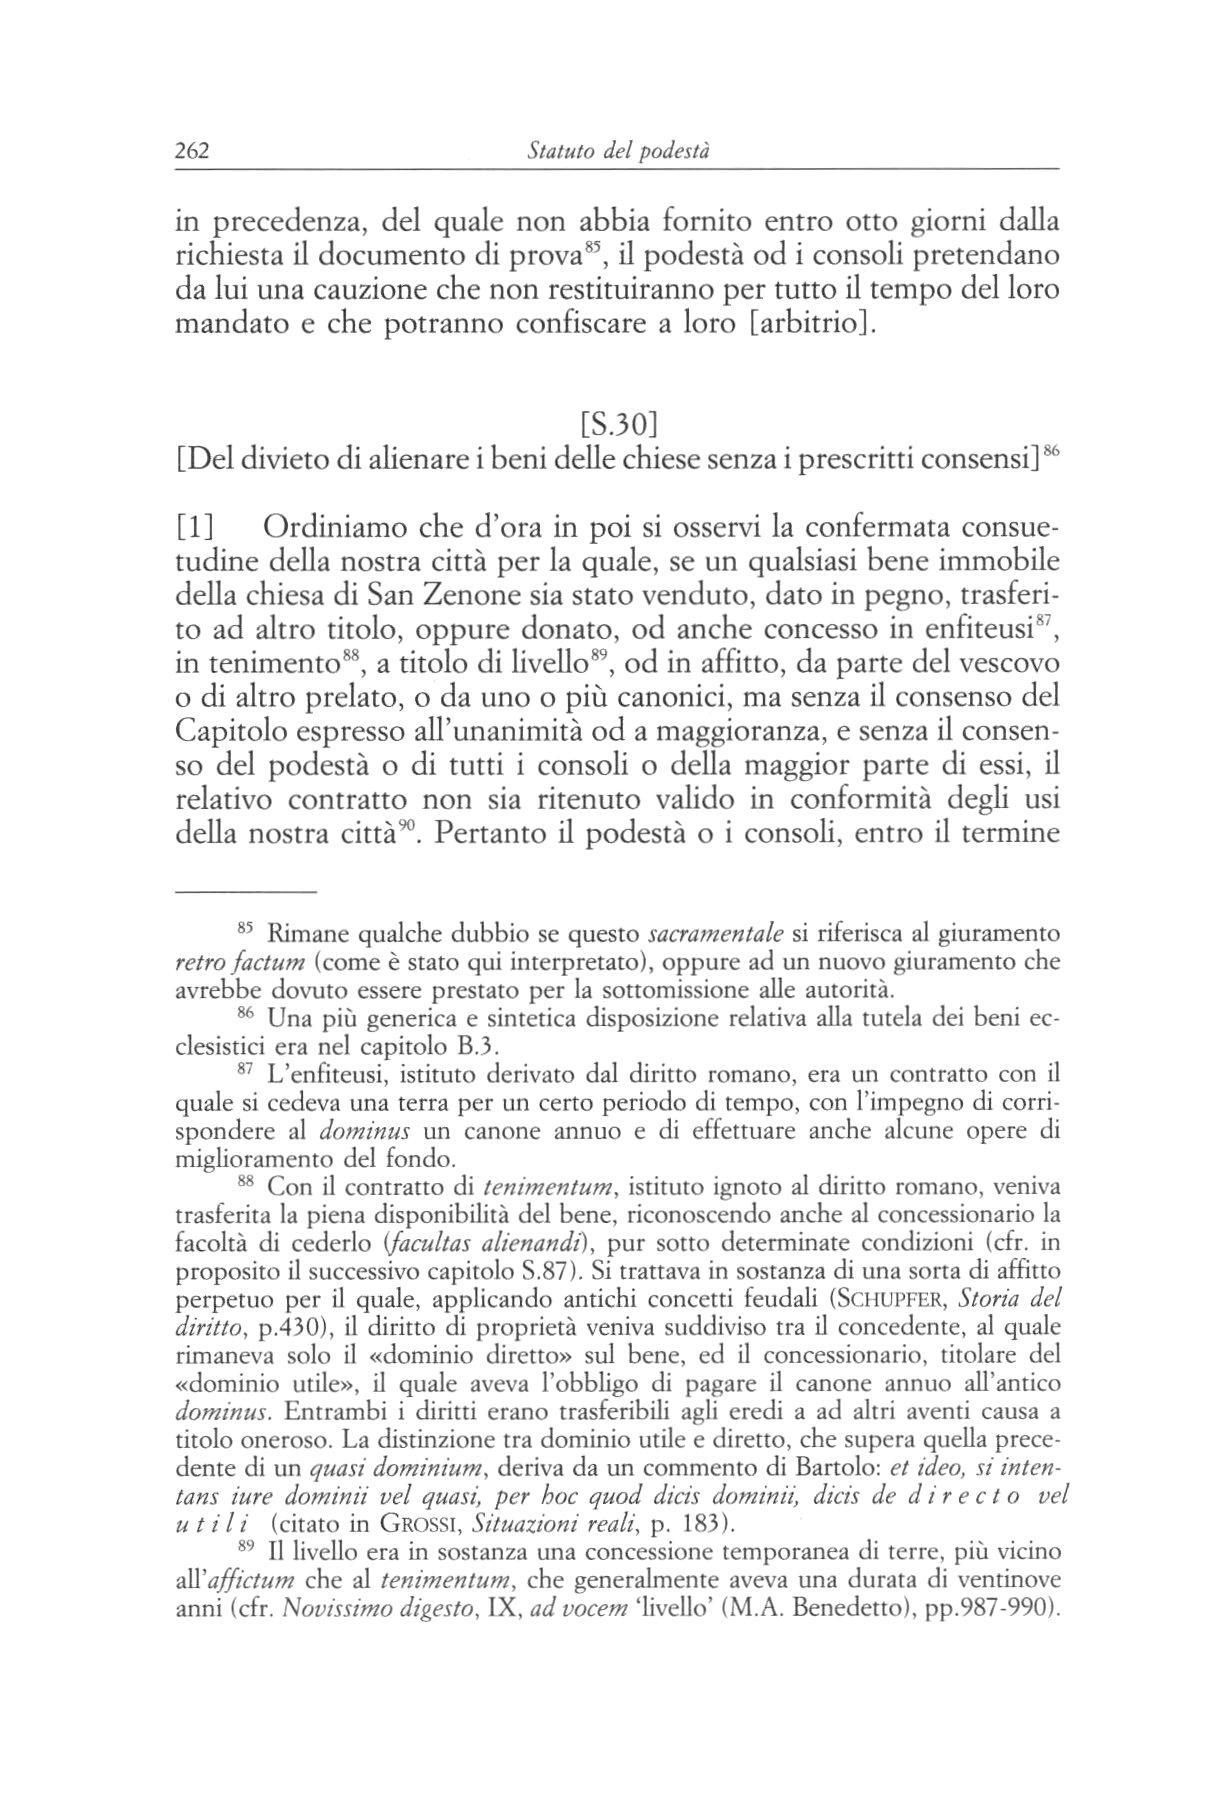 statuti pistoiesi del sec.XII 0262.jpg